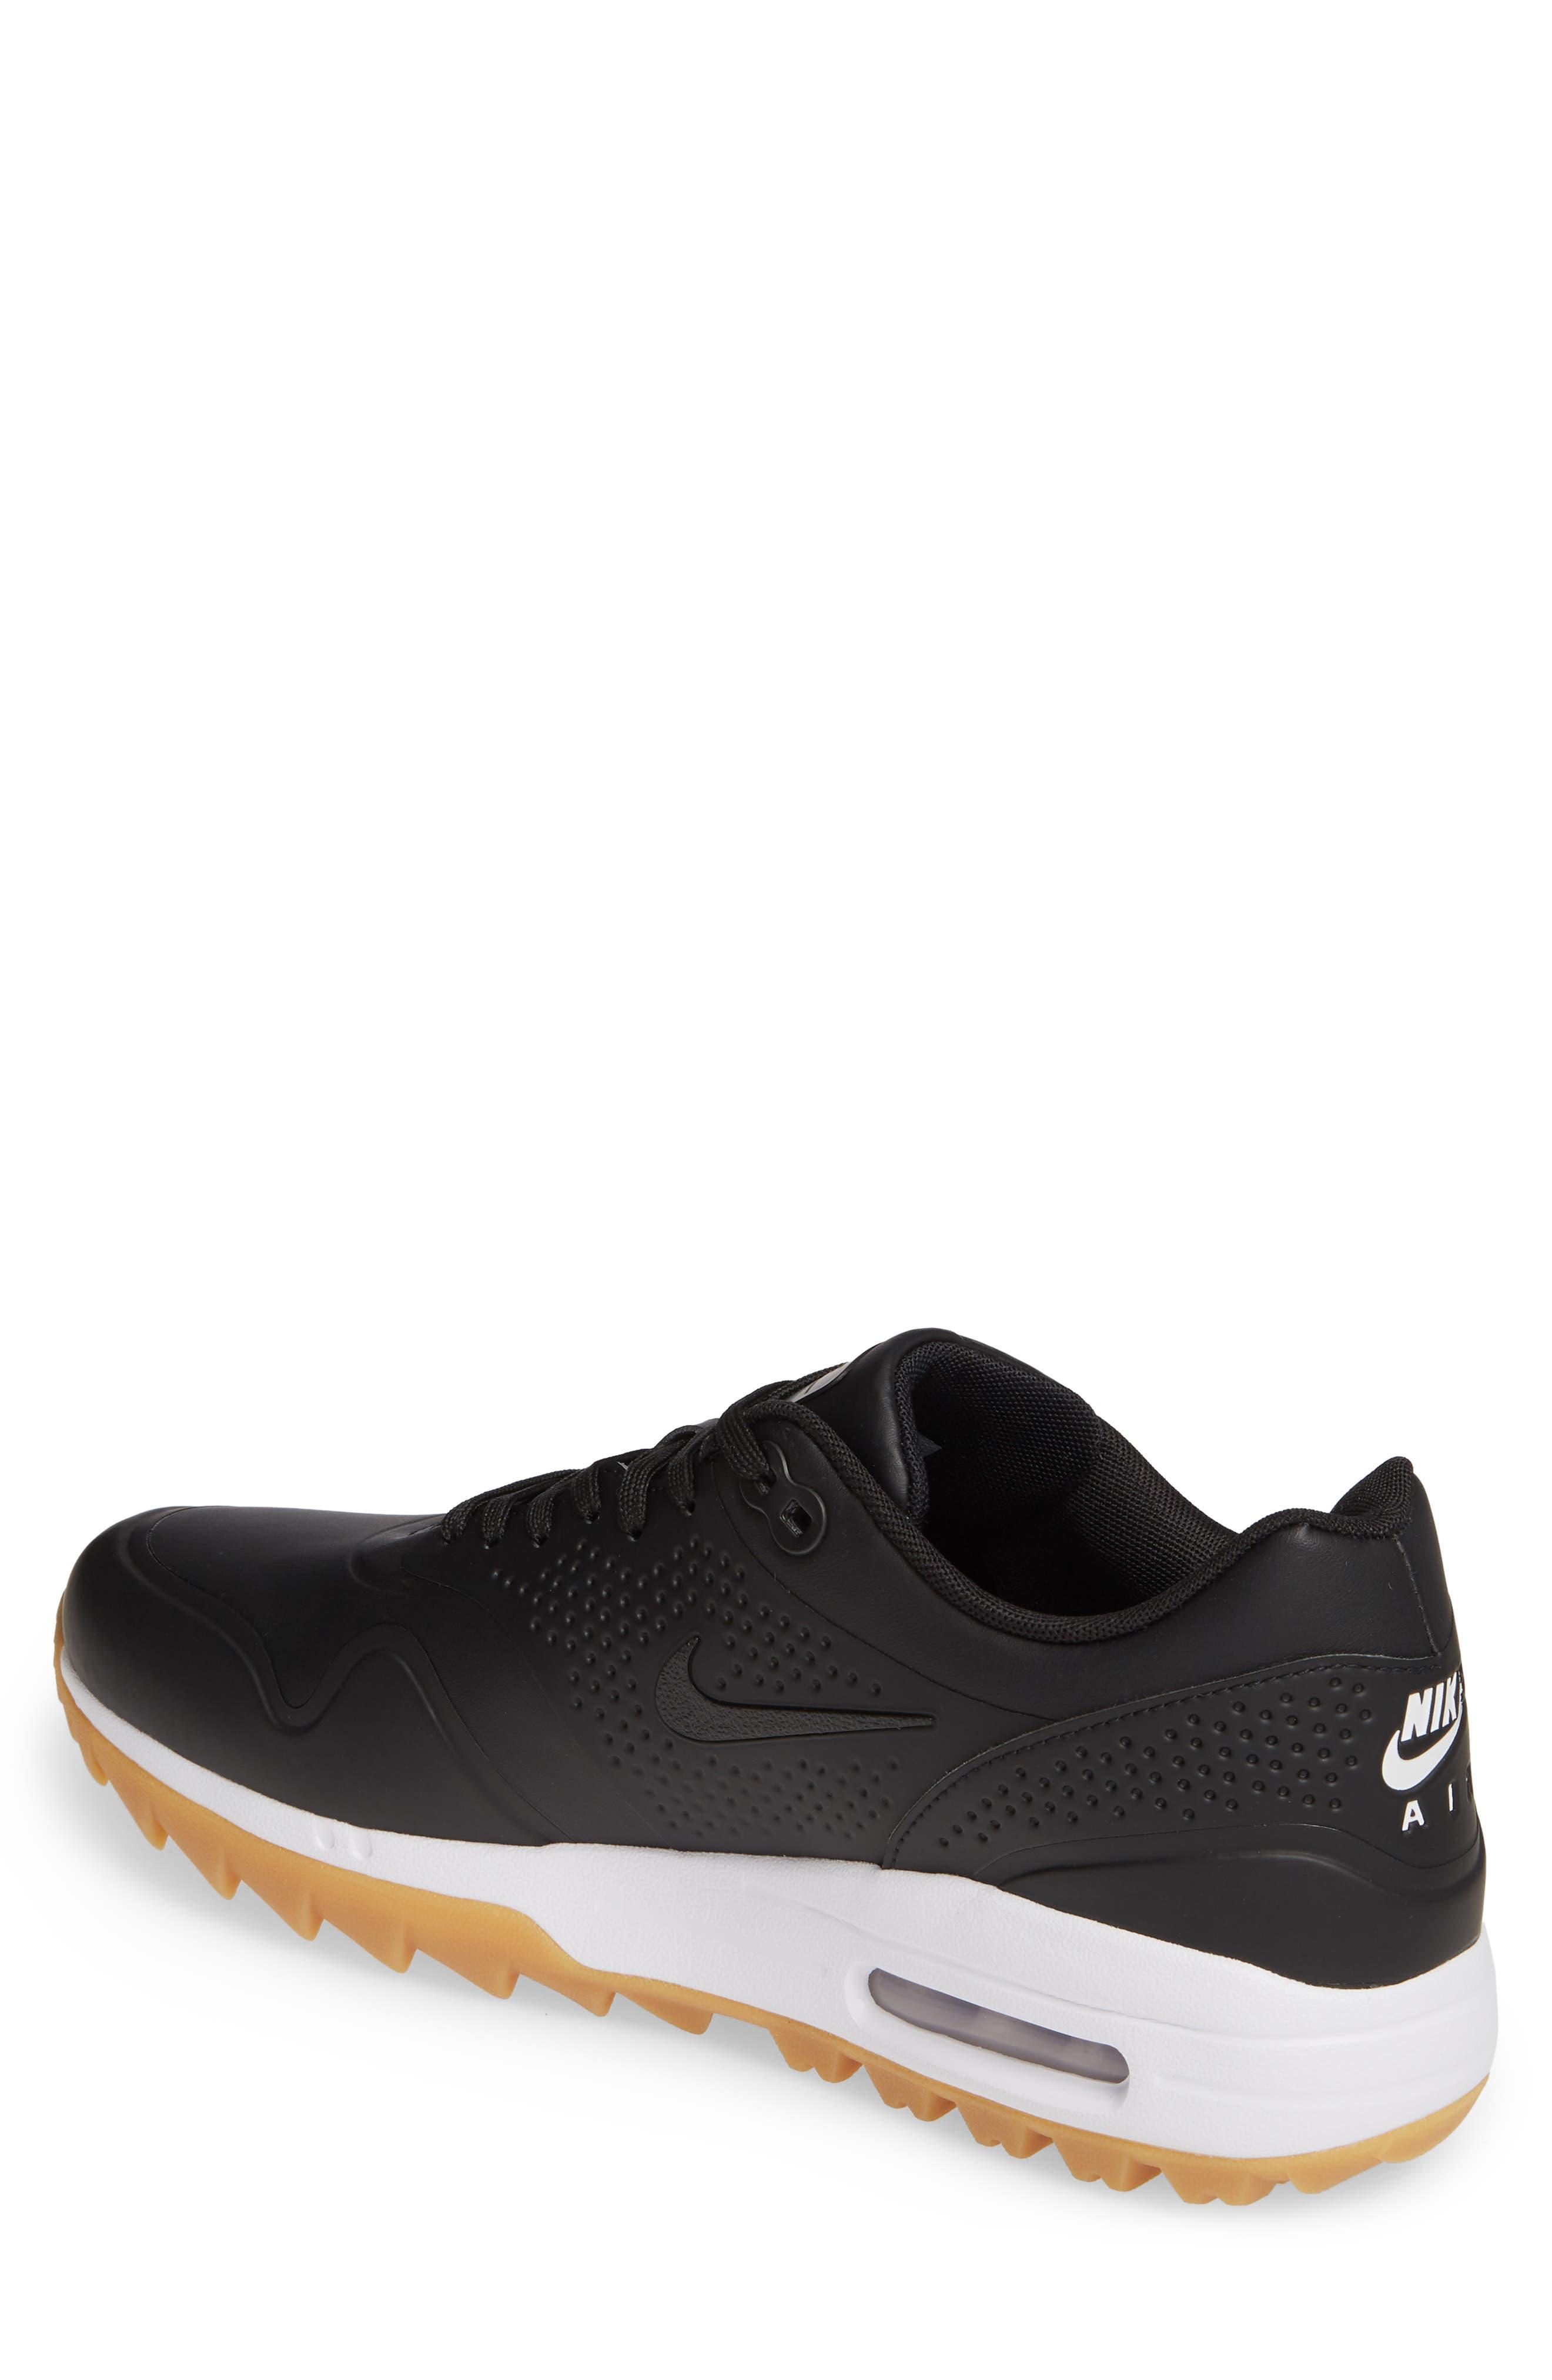 NIKE, Air Max 1 Golf Sneaker, Alternate thumbnail 2, color, BLACK/ GUM LIGHT BROWN